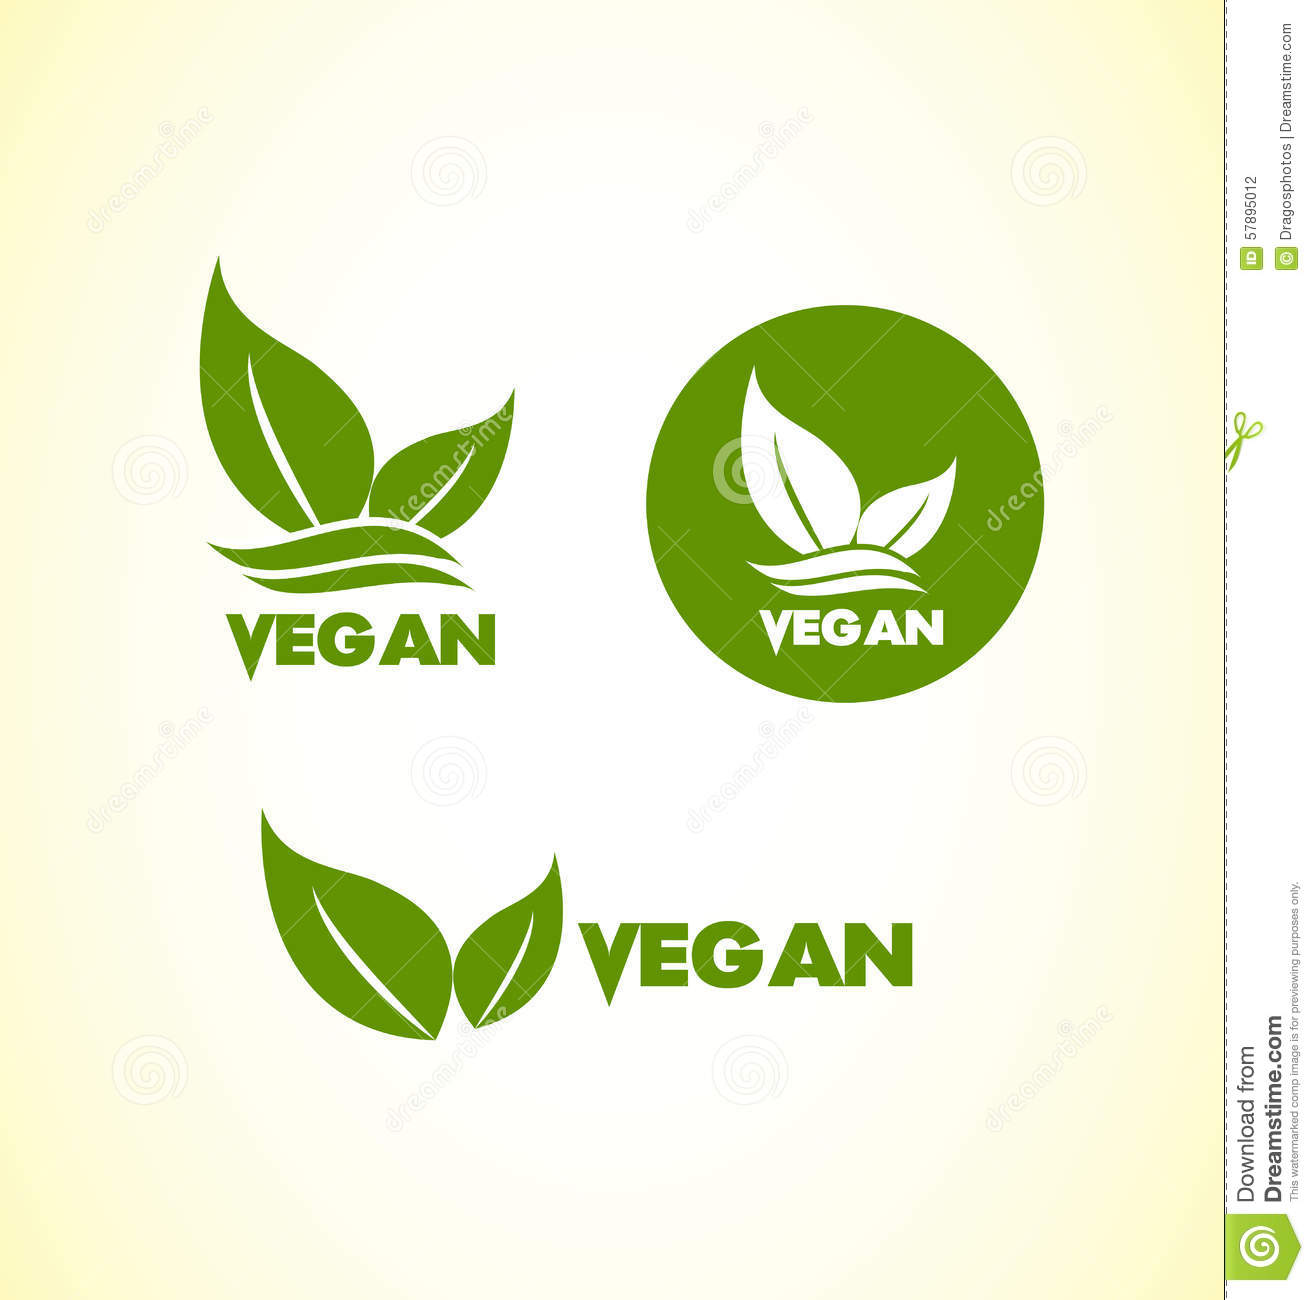 1314x1300 Vegan Logos